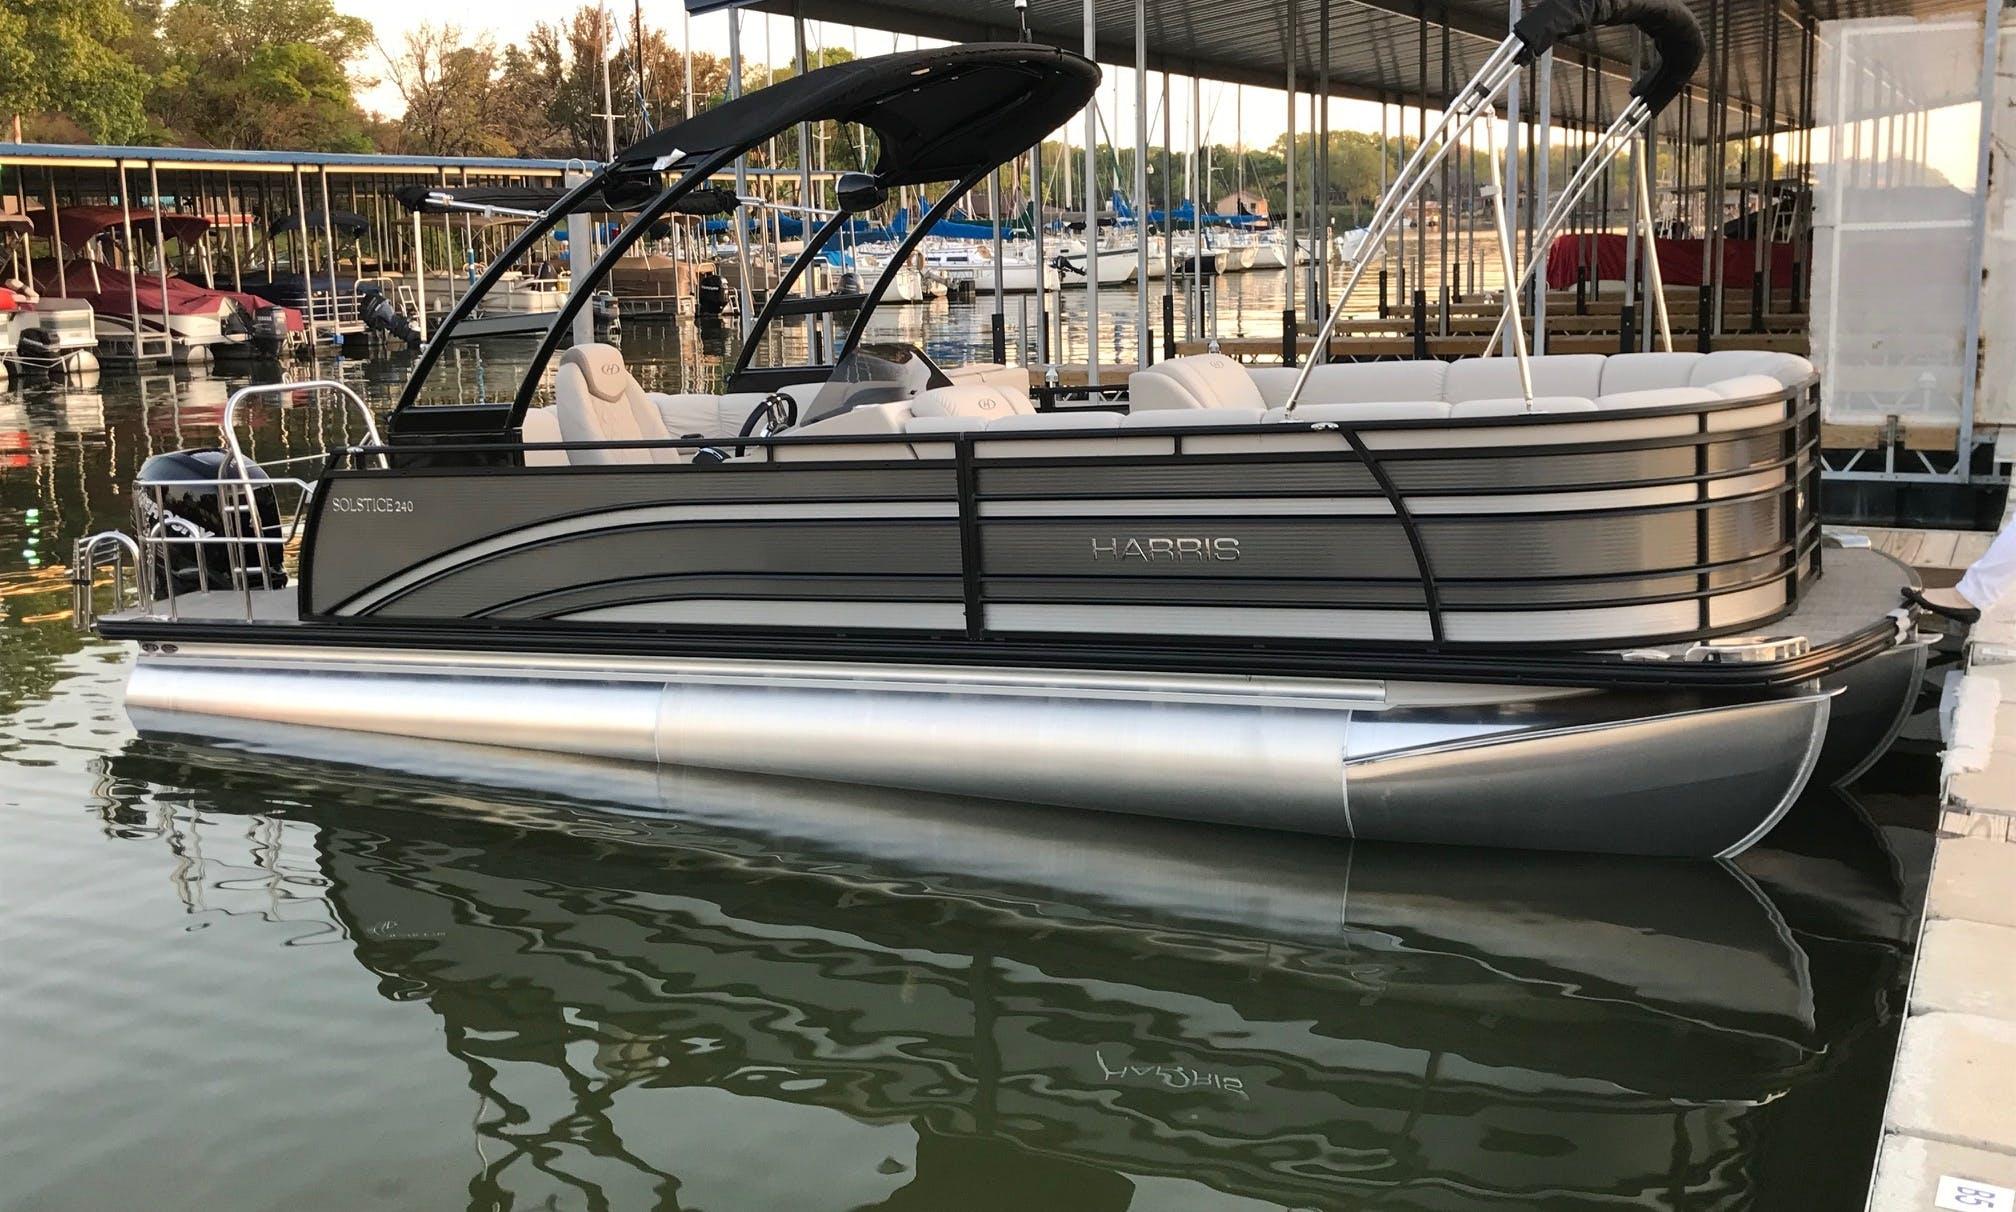 Not your normal rental pontoon!